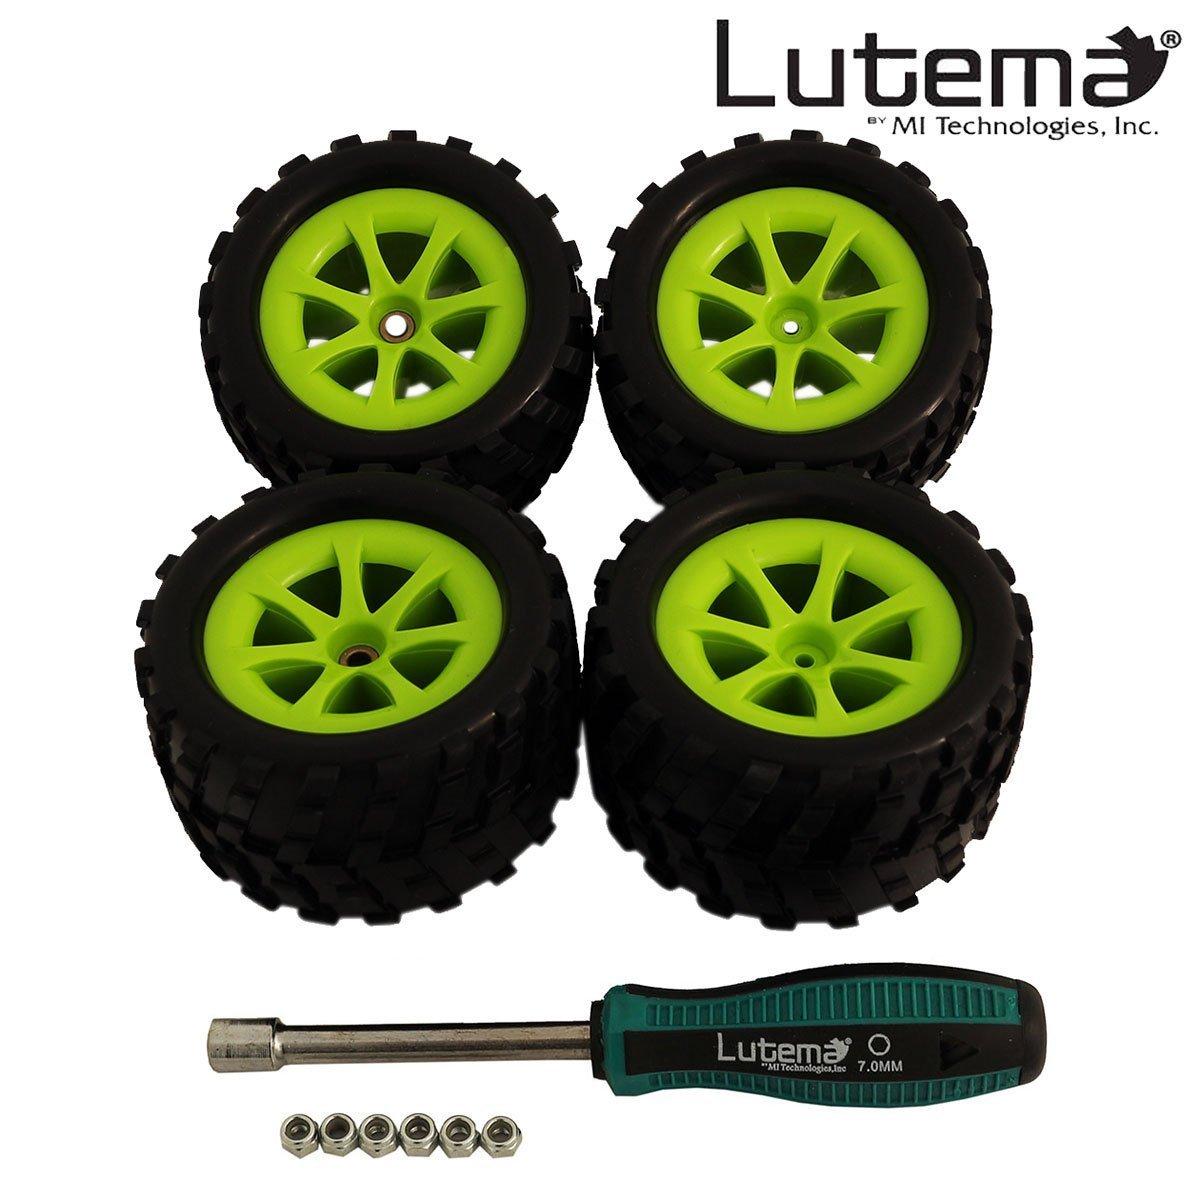 Lutema Hyp-R-Baja 2.4Ghz Big Bruiser Complete Set of Farbe Wheels With Tires - Grün